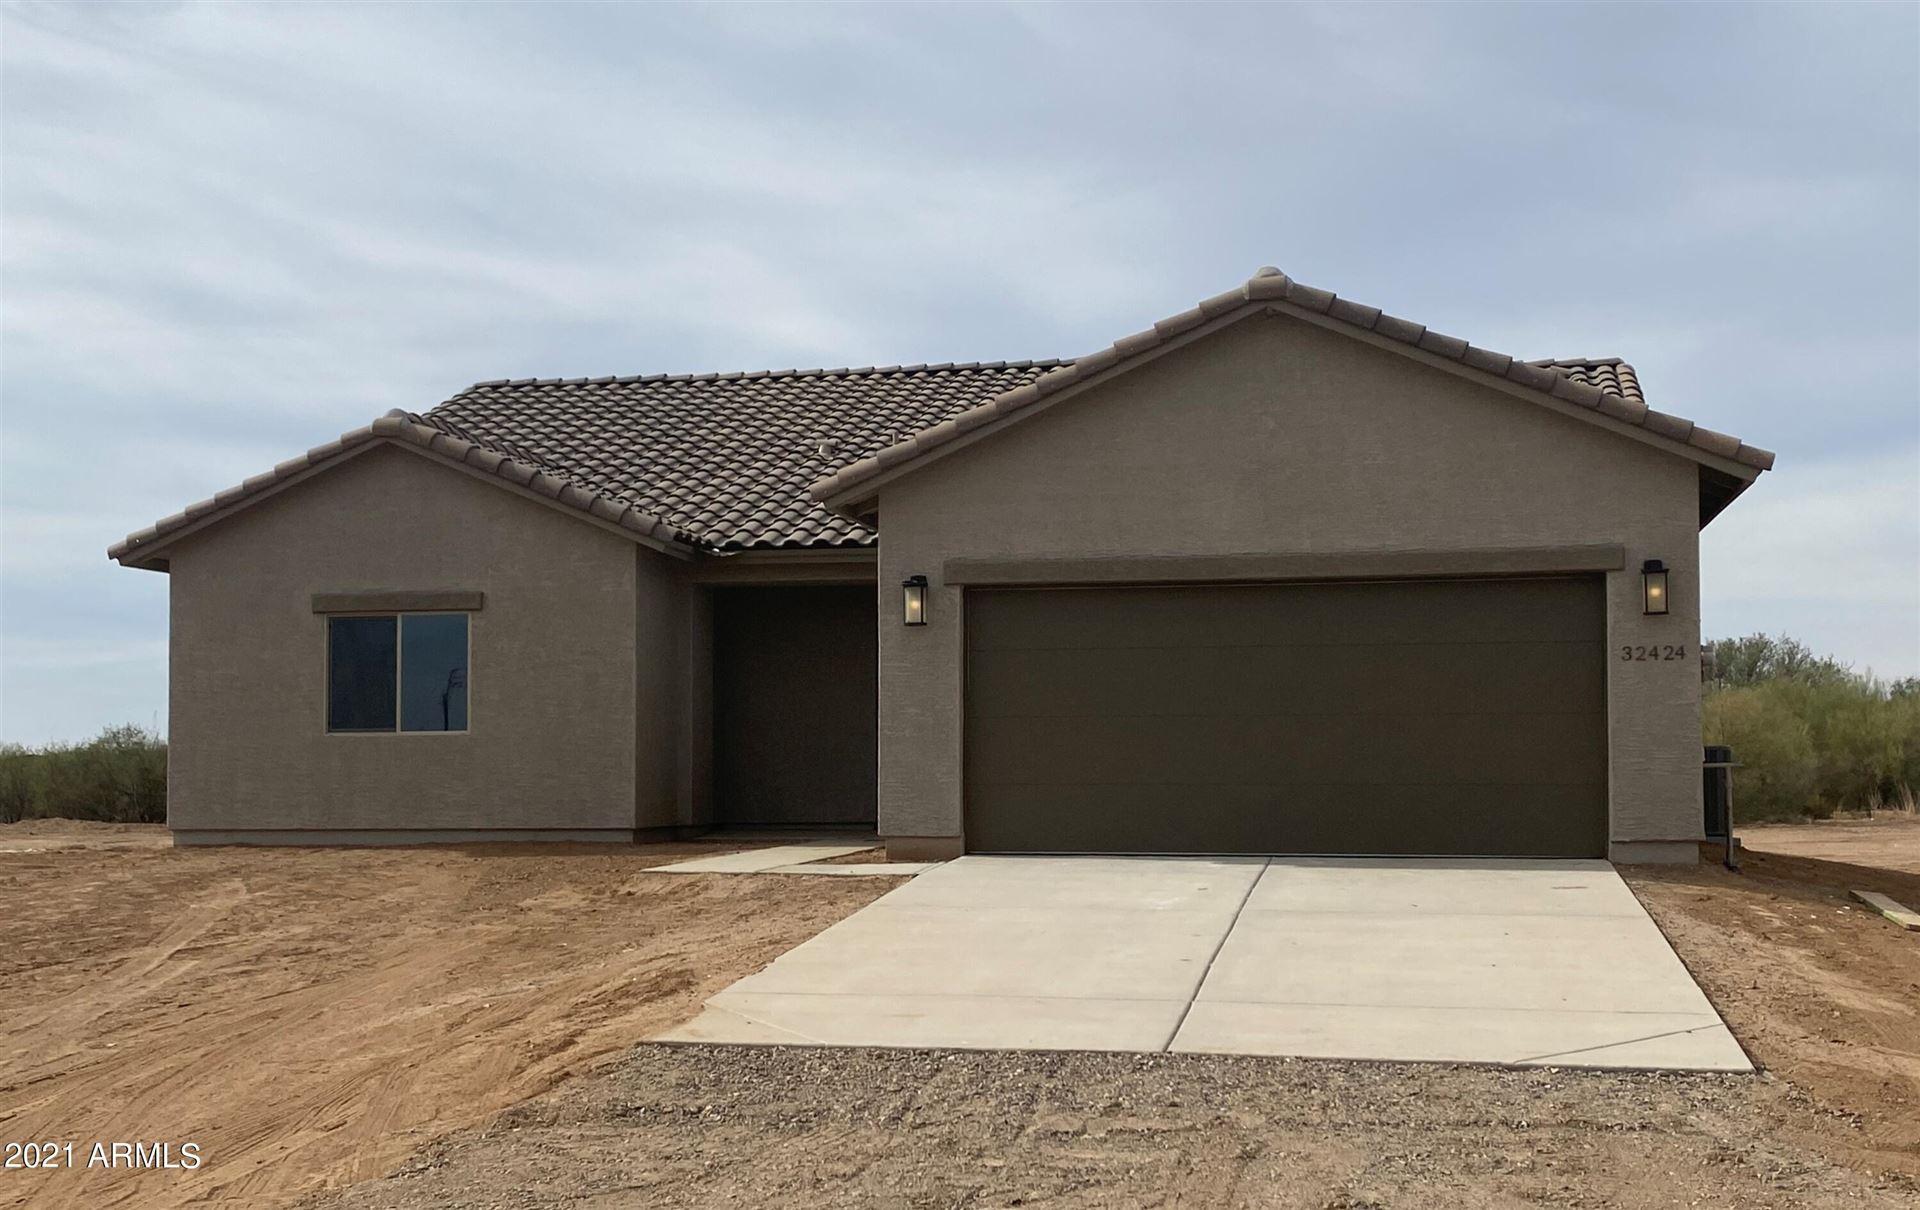 Photo of 32424 N 225th Drive, Wittmann, AZ 85361 (MLS # 6279989)